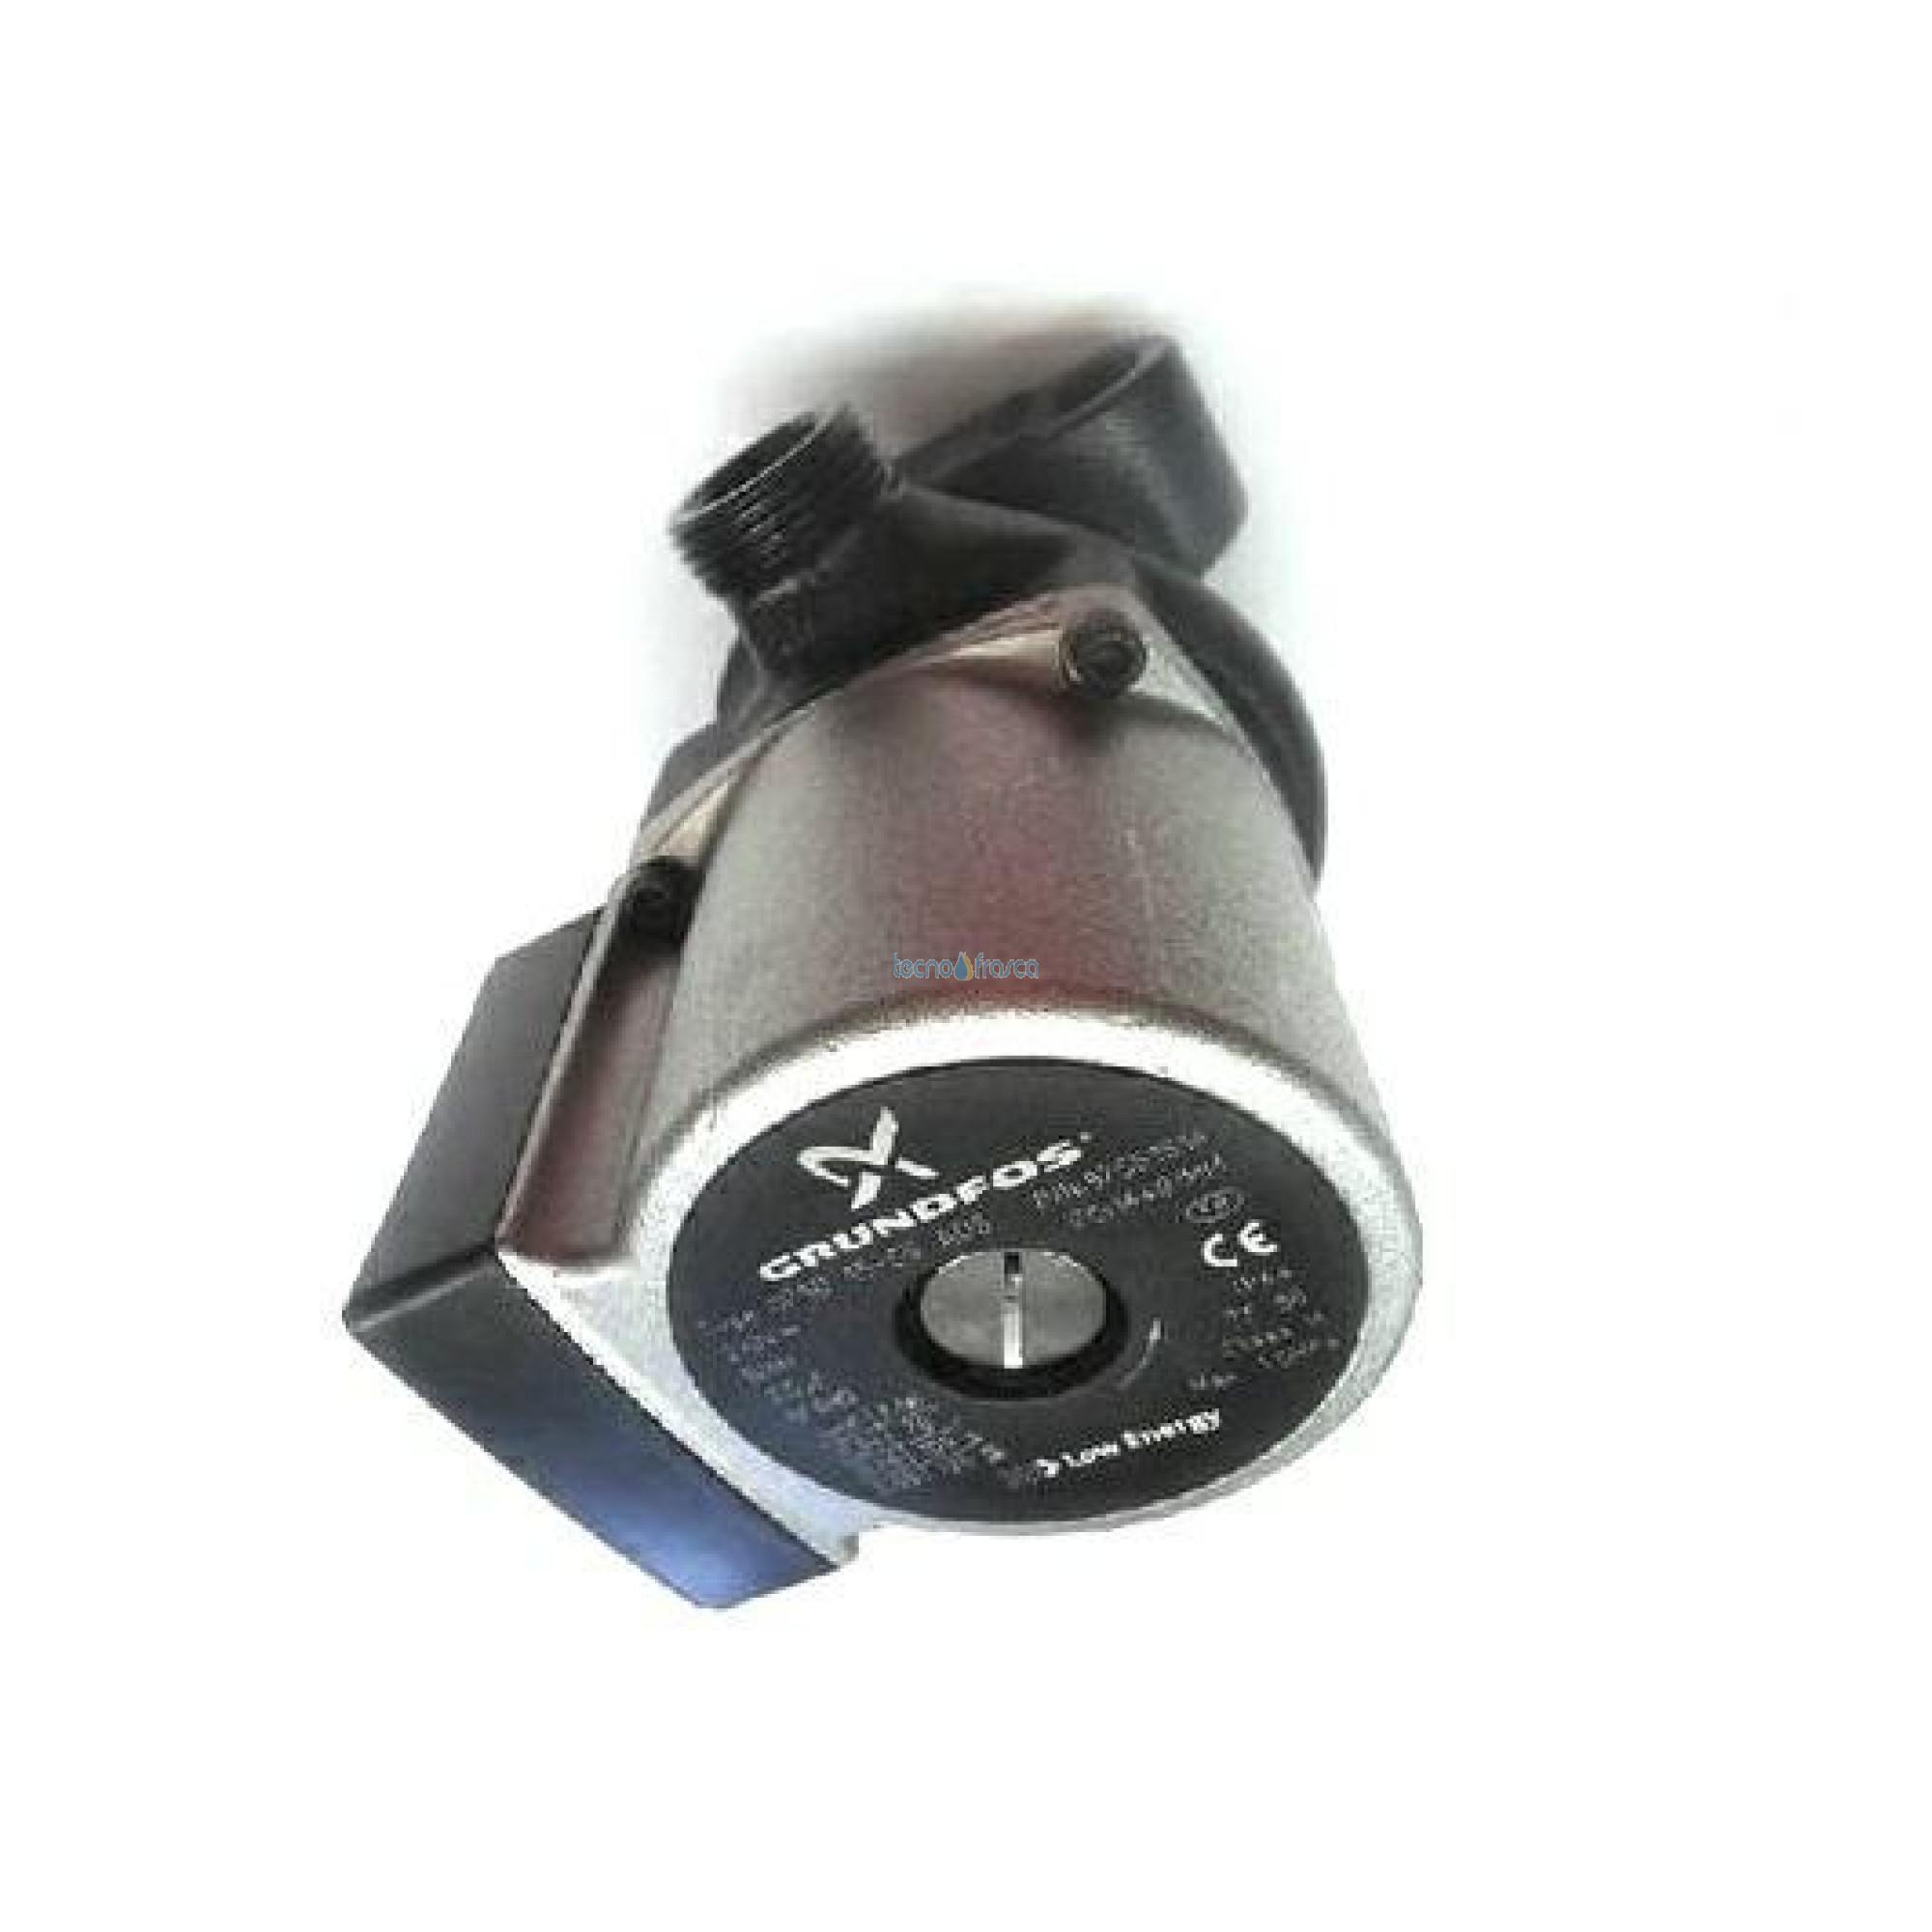 Immergas circolatore ups 15/50 ao 1.016654